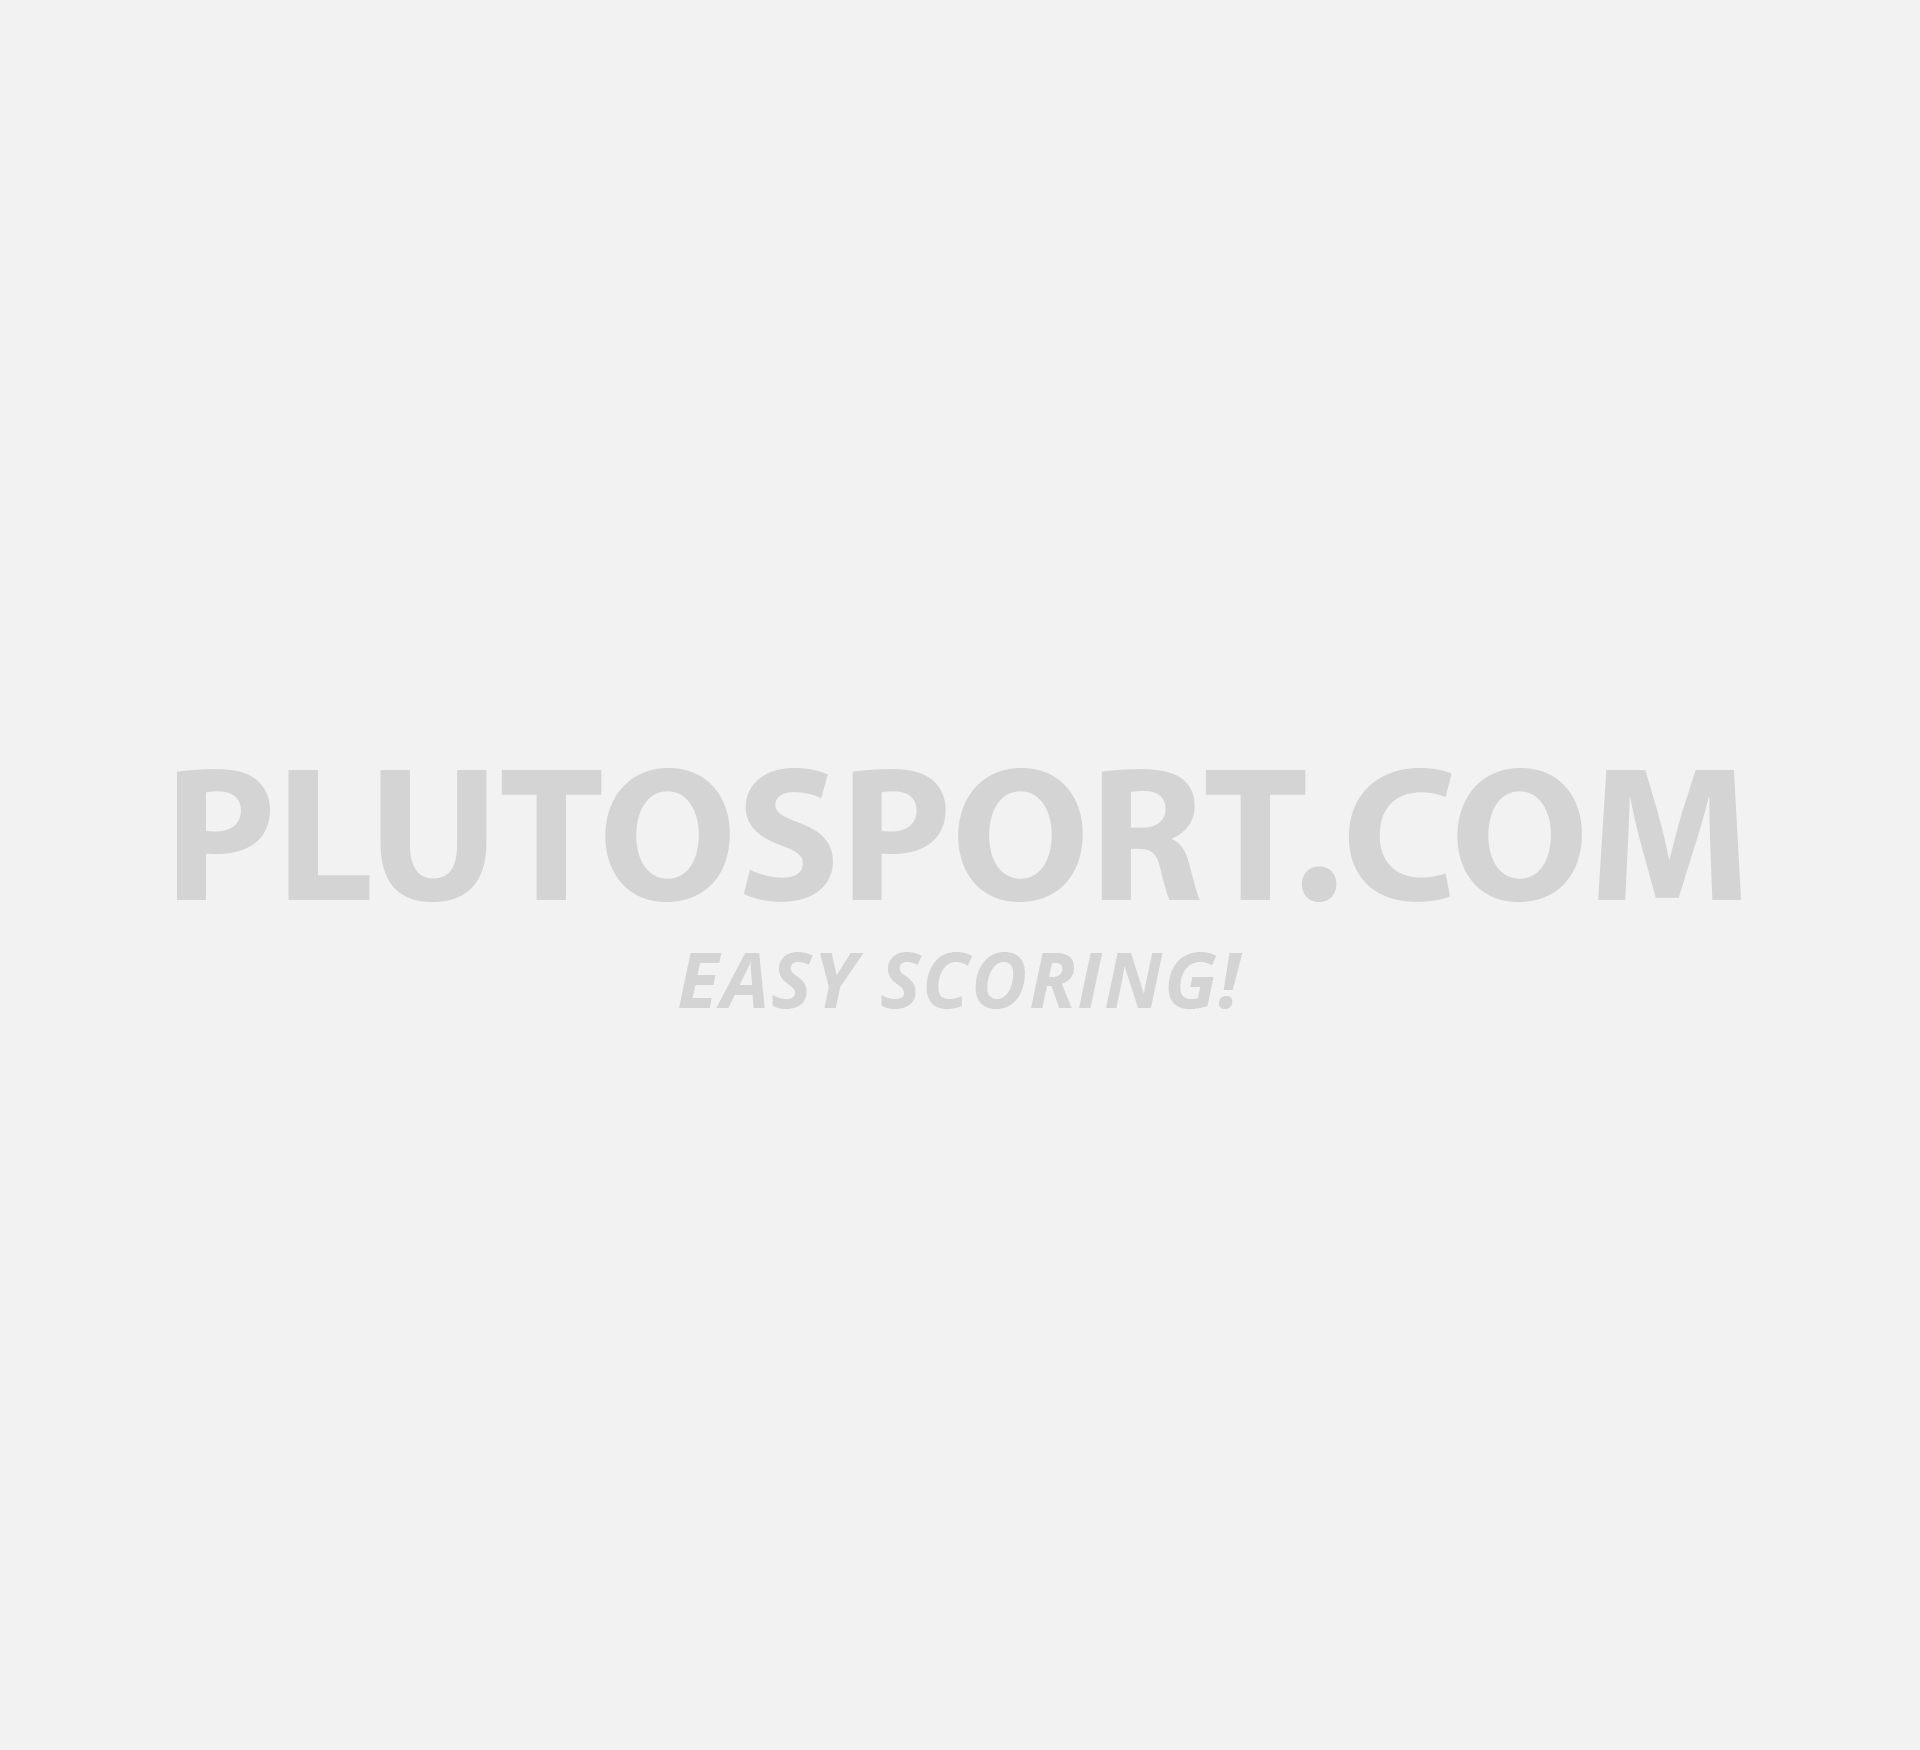 06ccb97c2700 Merrell Hydro Hiker Sandal Junior - Sandals - Shoes - Outdoor - Sports